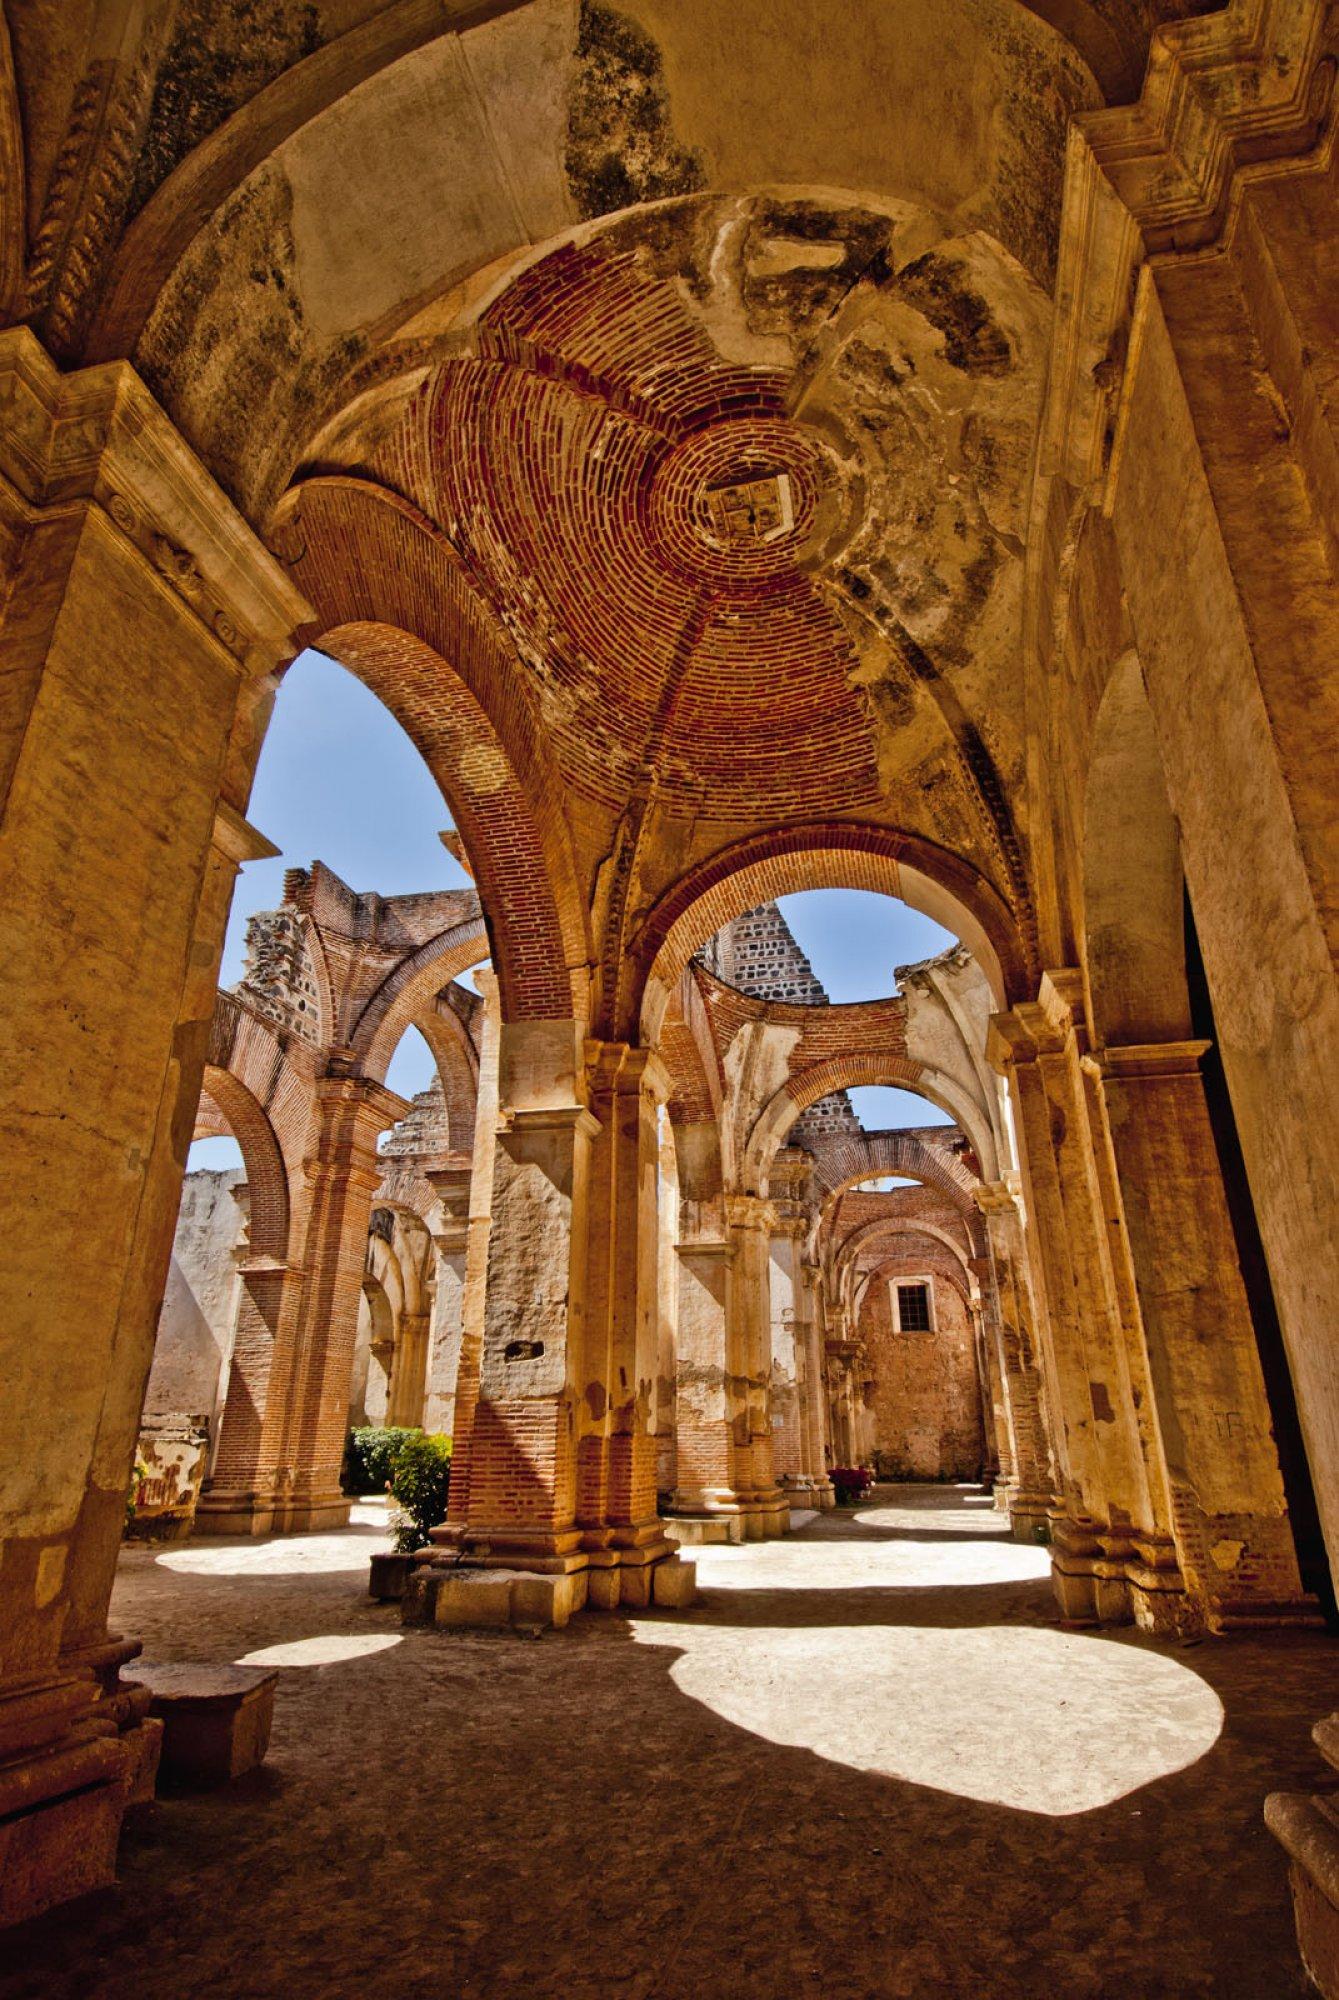 https://bubo.sk/uploads/galleries/7388/guatemala-ruins-of-san-jose-cathedral-in-antigua-de-guatemala.jpg